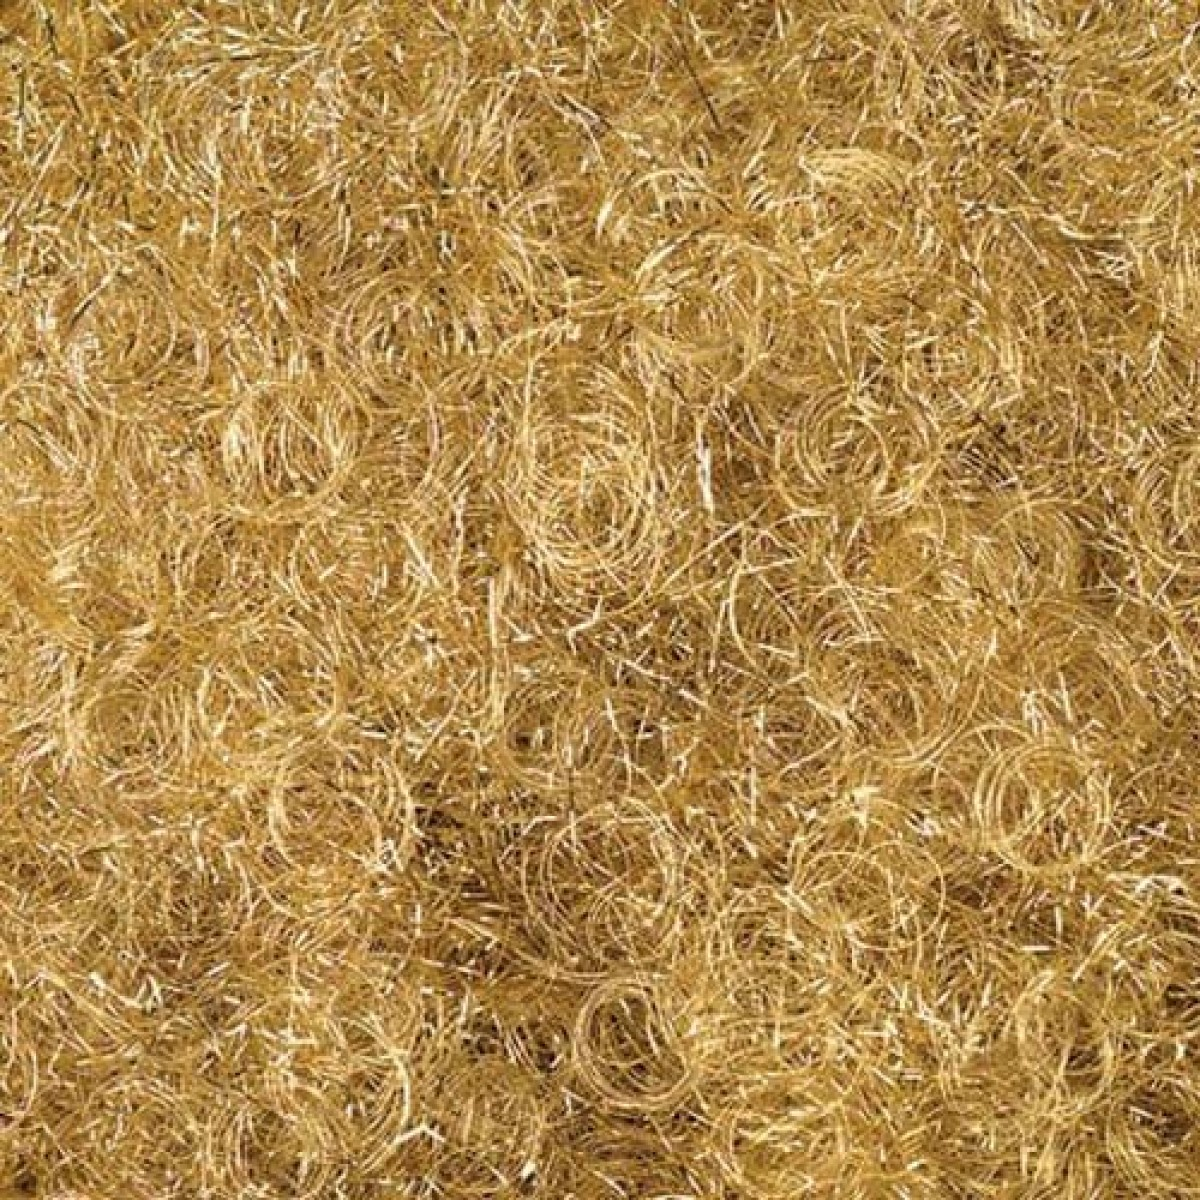 Efco Μαλλί Αγγέλου Χρυσό 20gr Υλικά Χειροτεχνίας